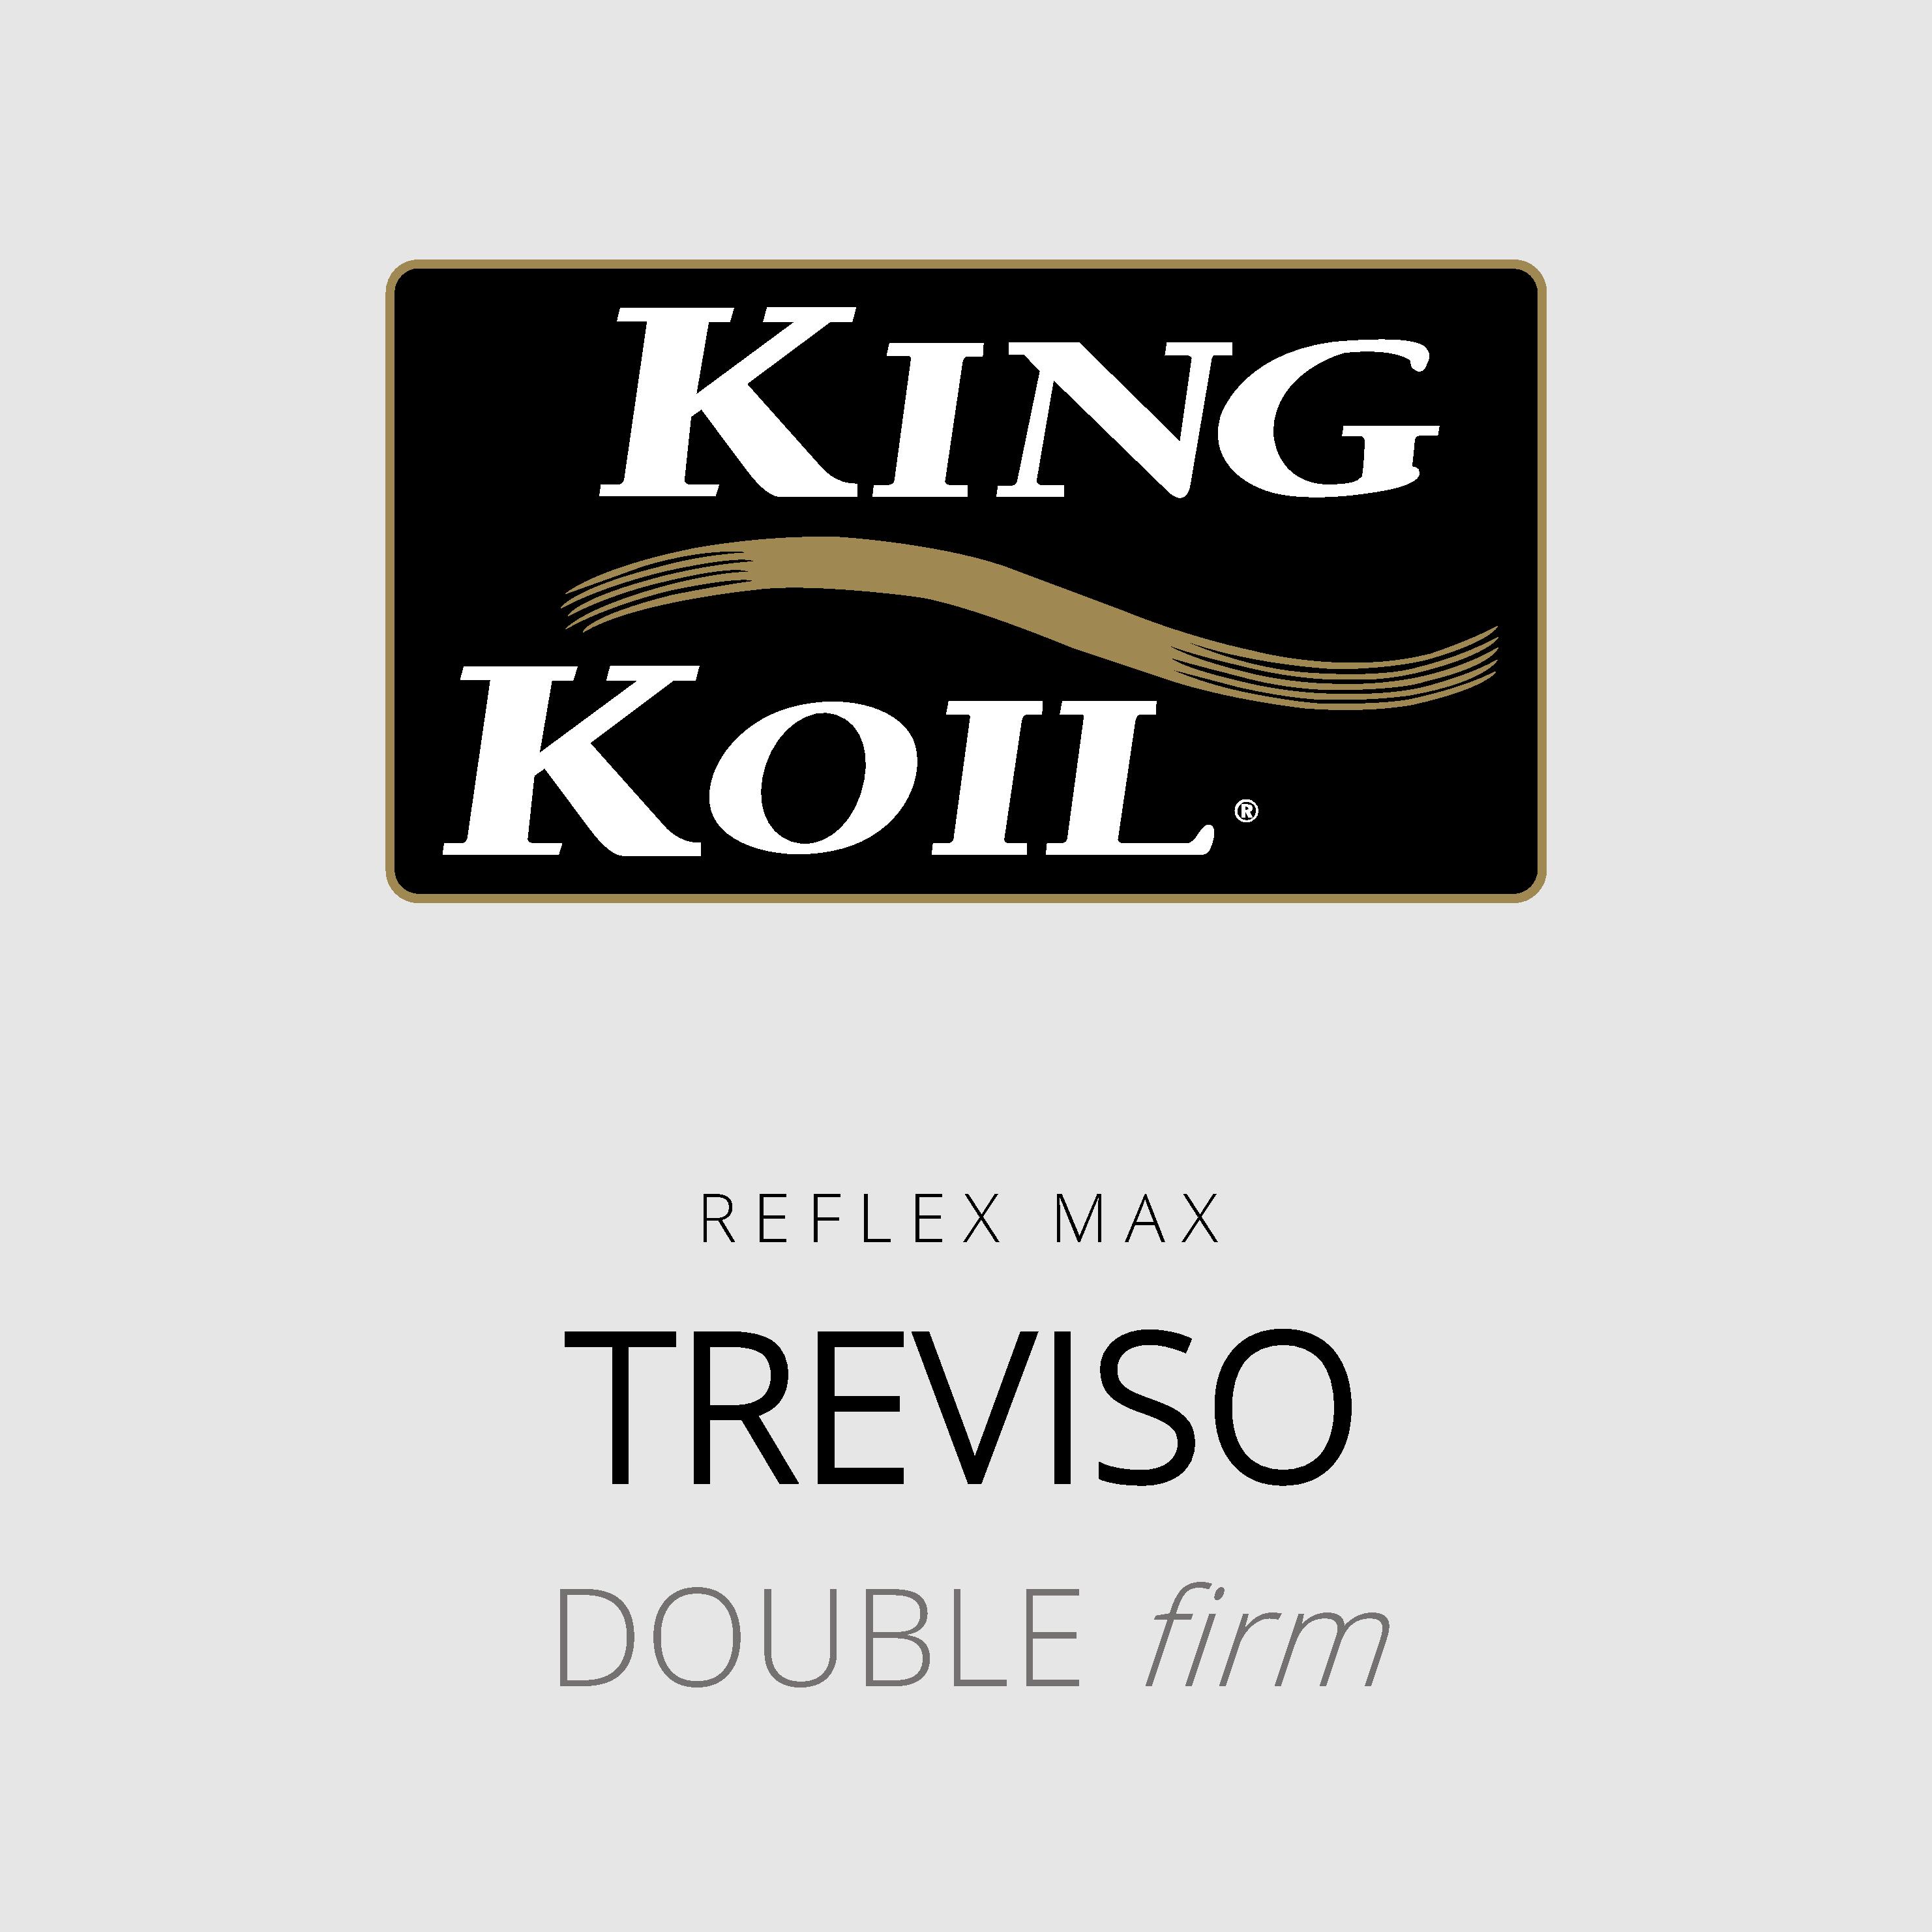 King Koil – Treviso – Reflex Max – Double Firm Mattress